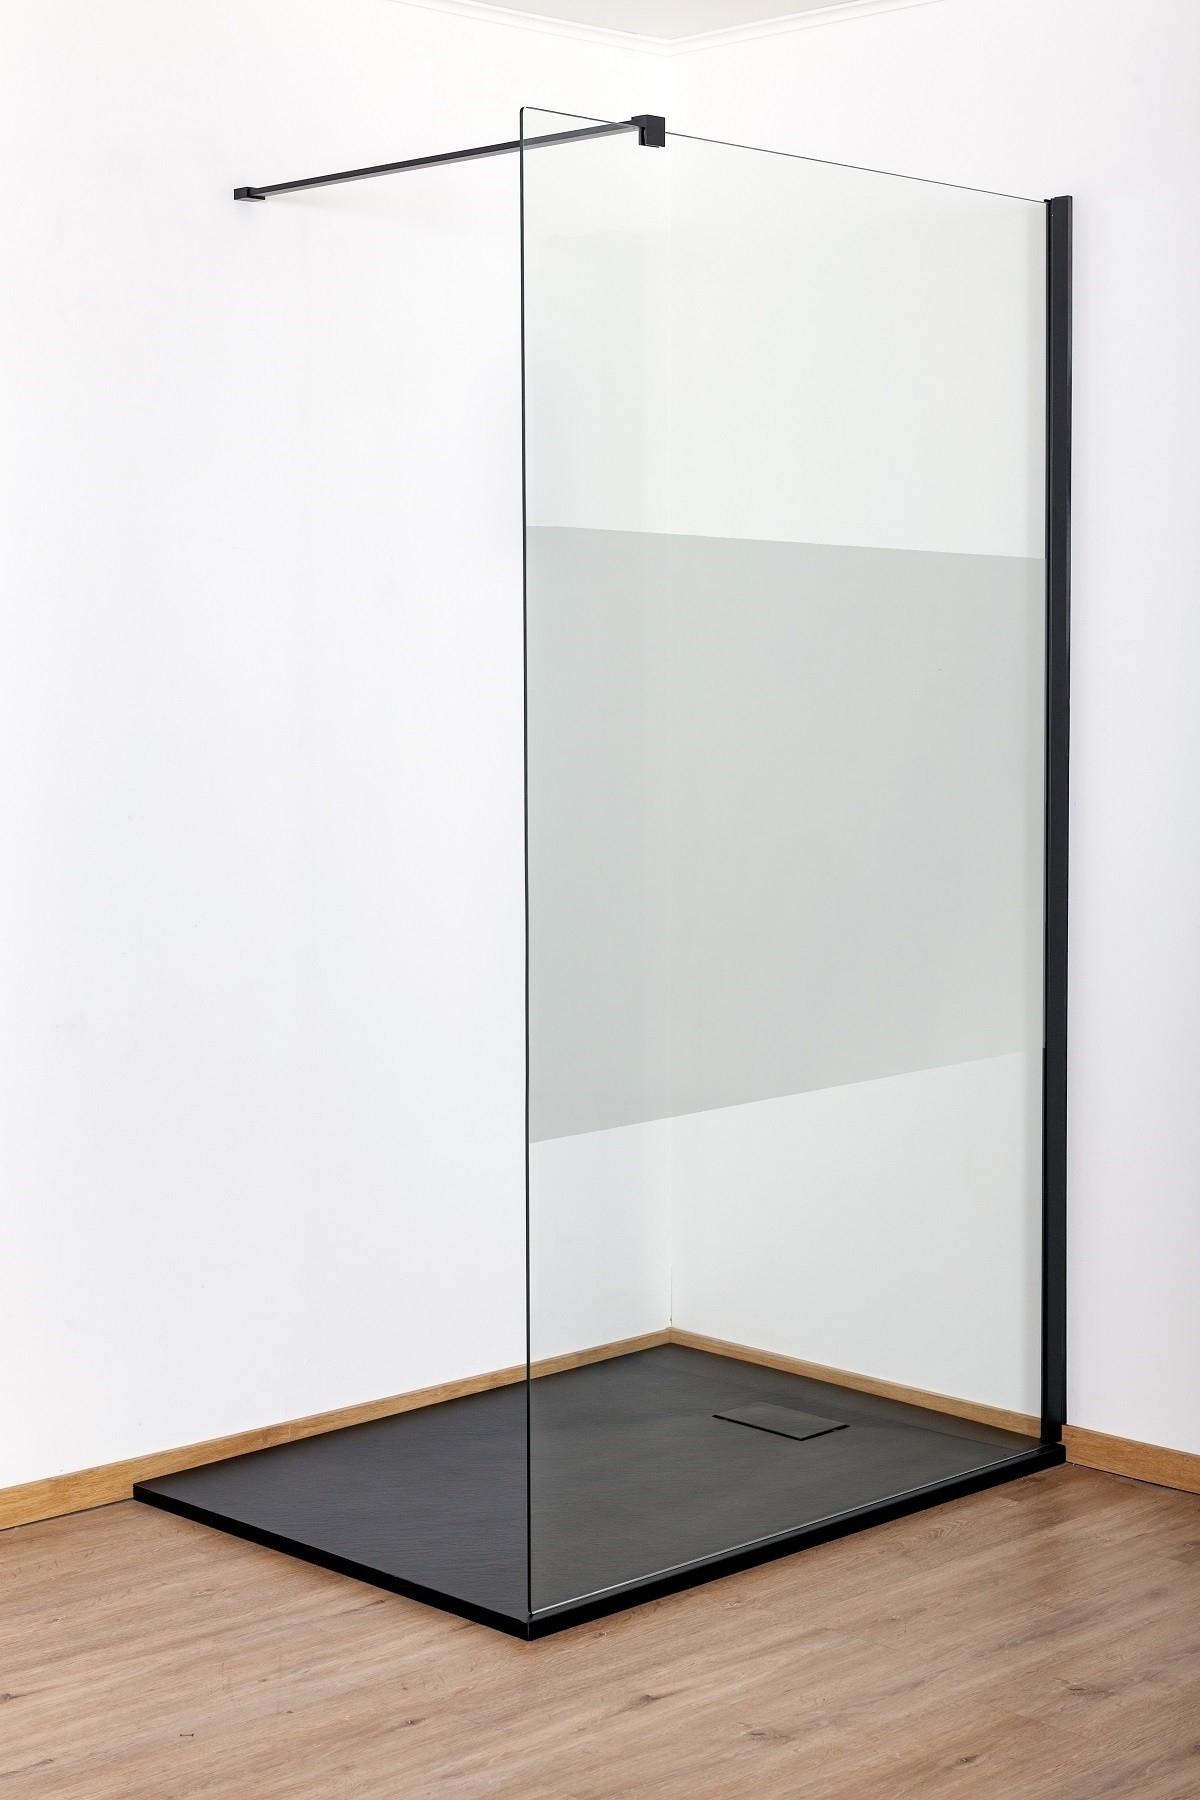 Sanifun douchewand Amber 200 x 157 mat.